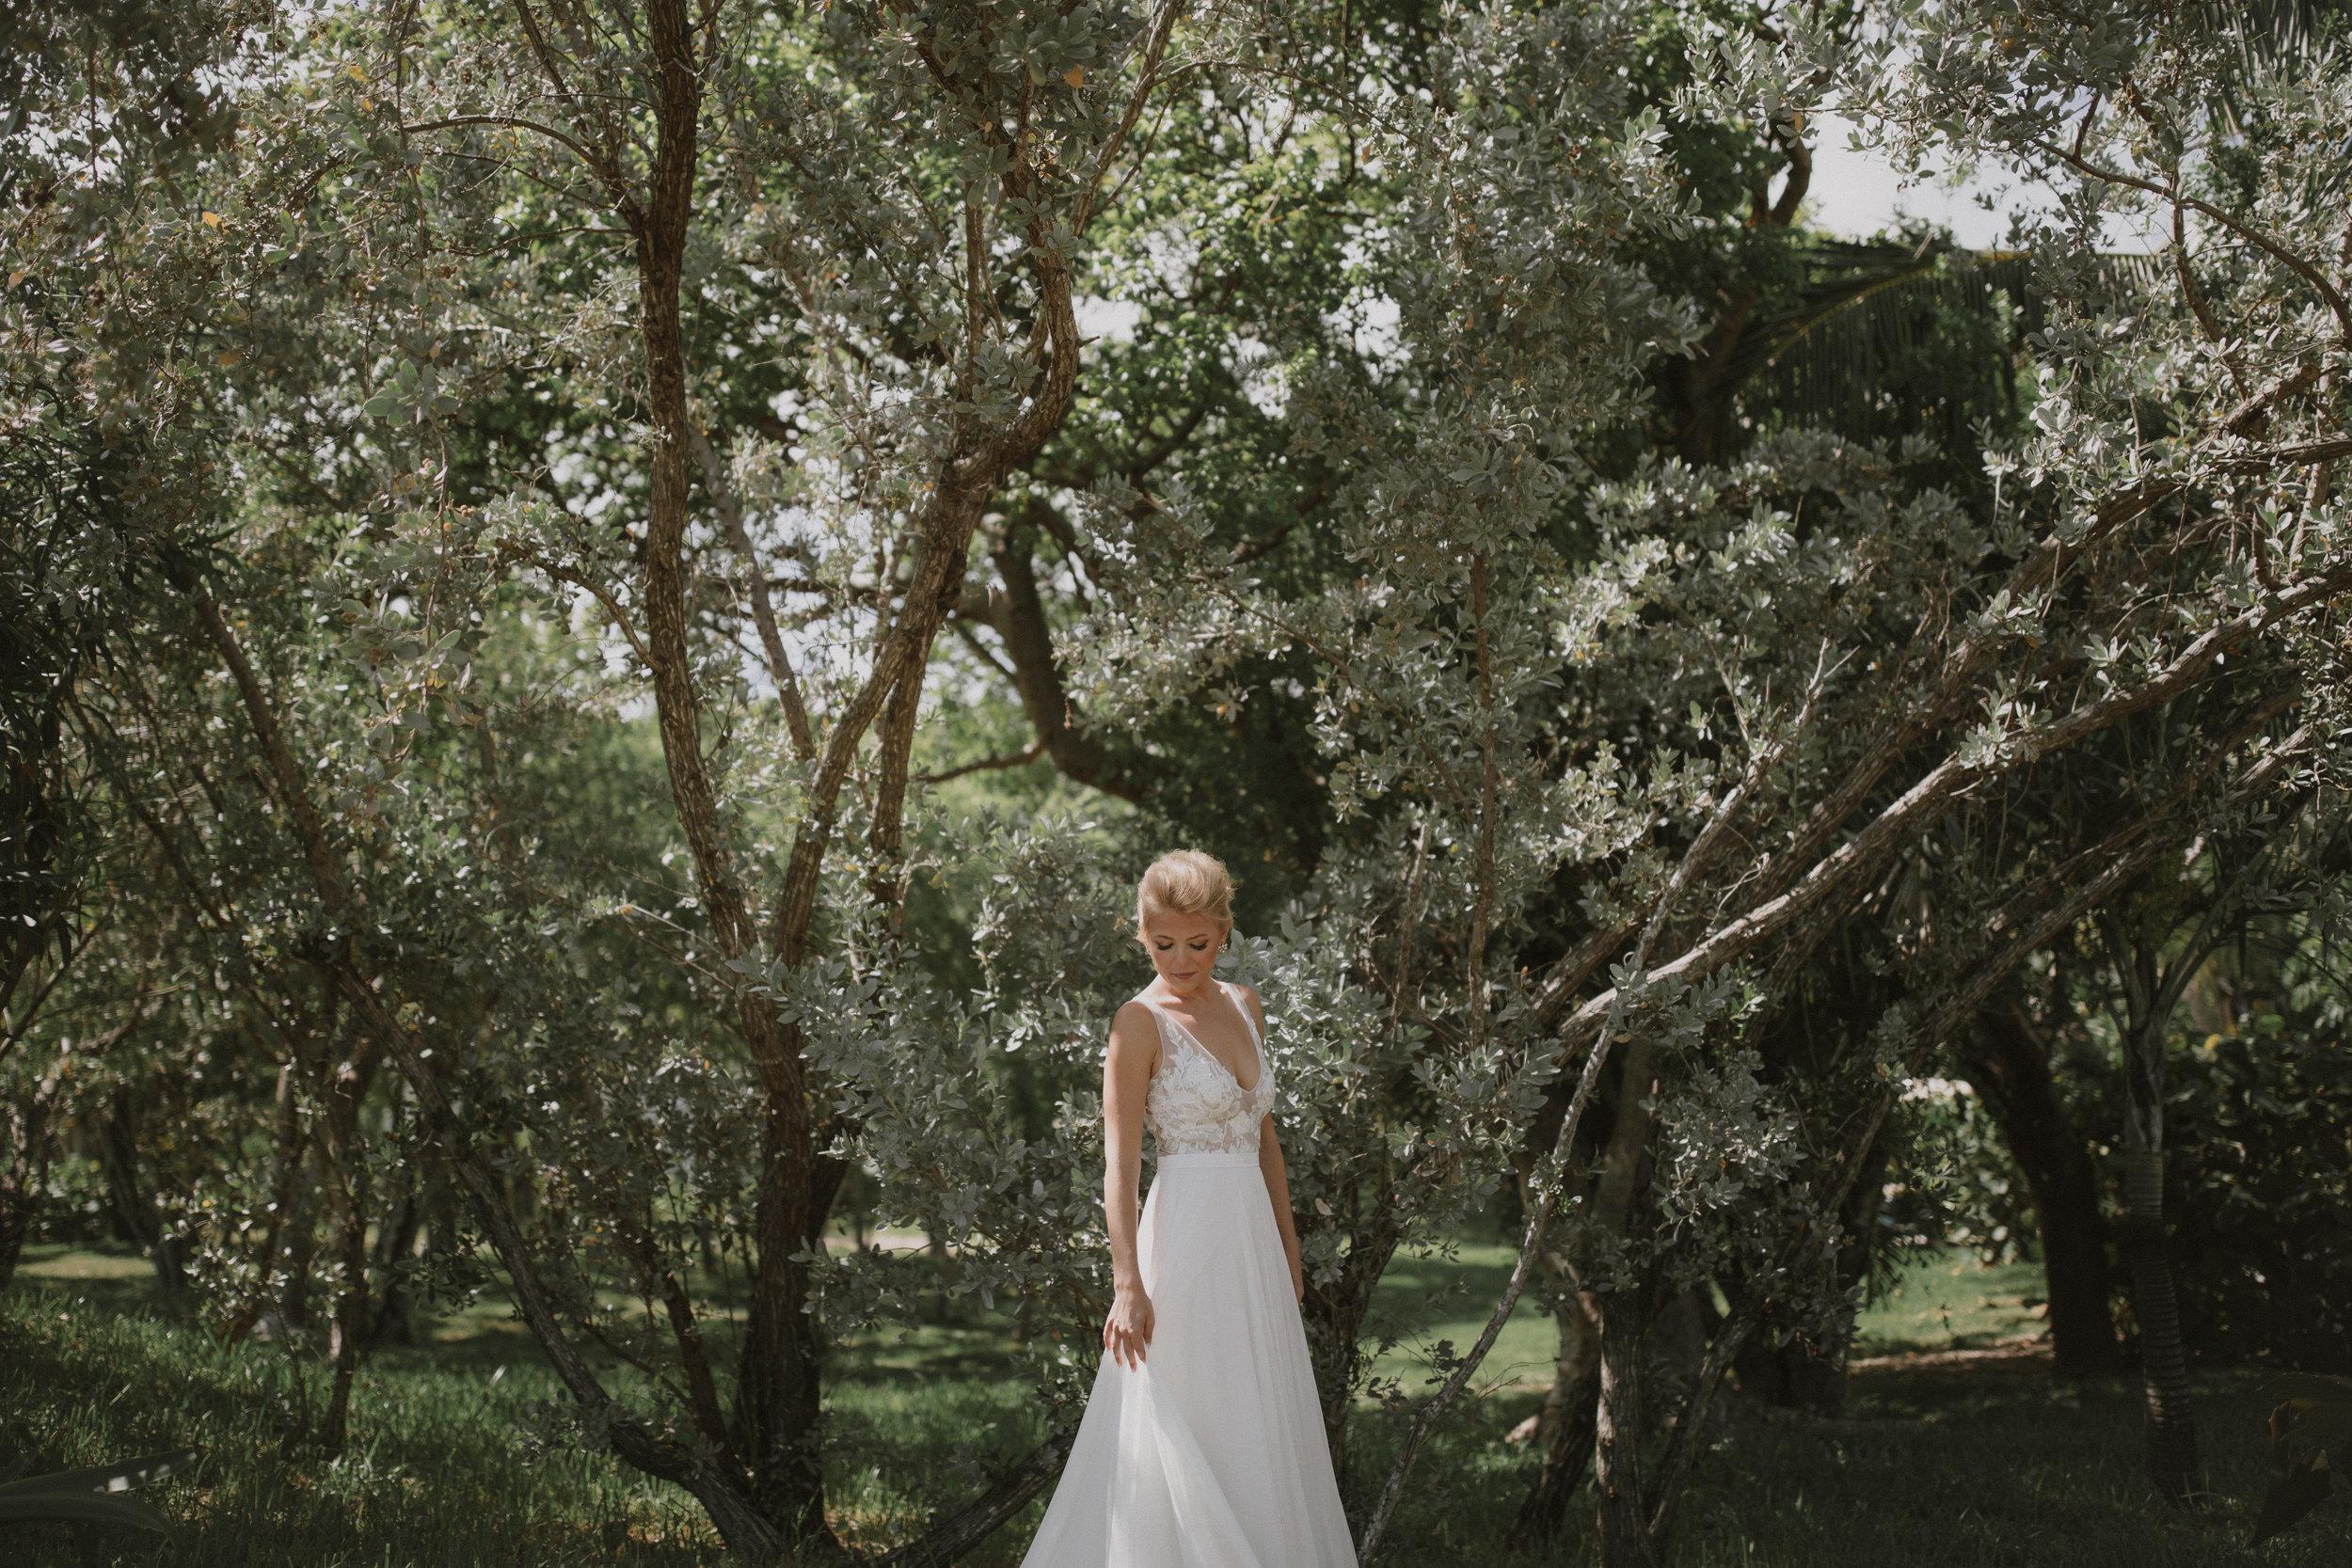 FrancescaGordon-562.jpg